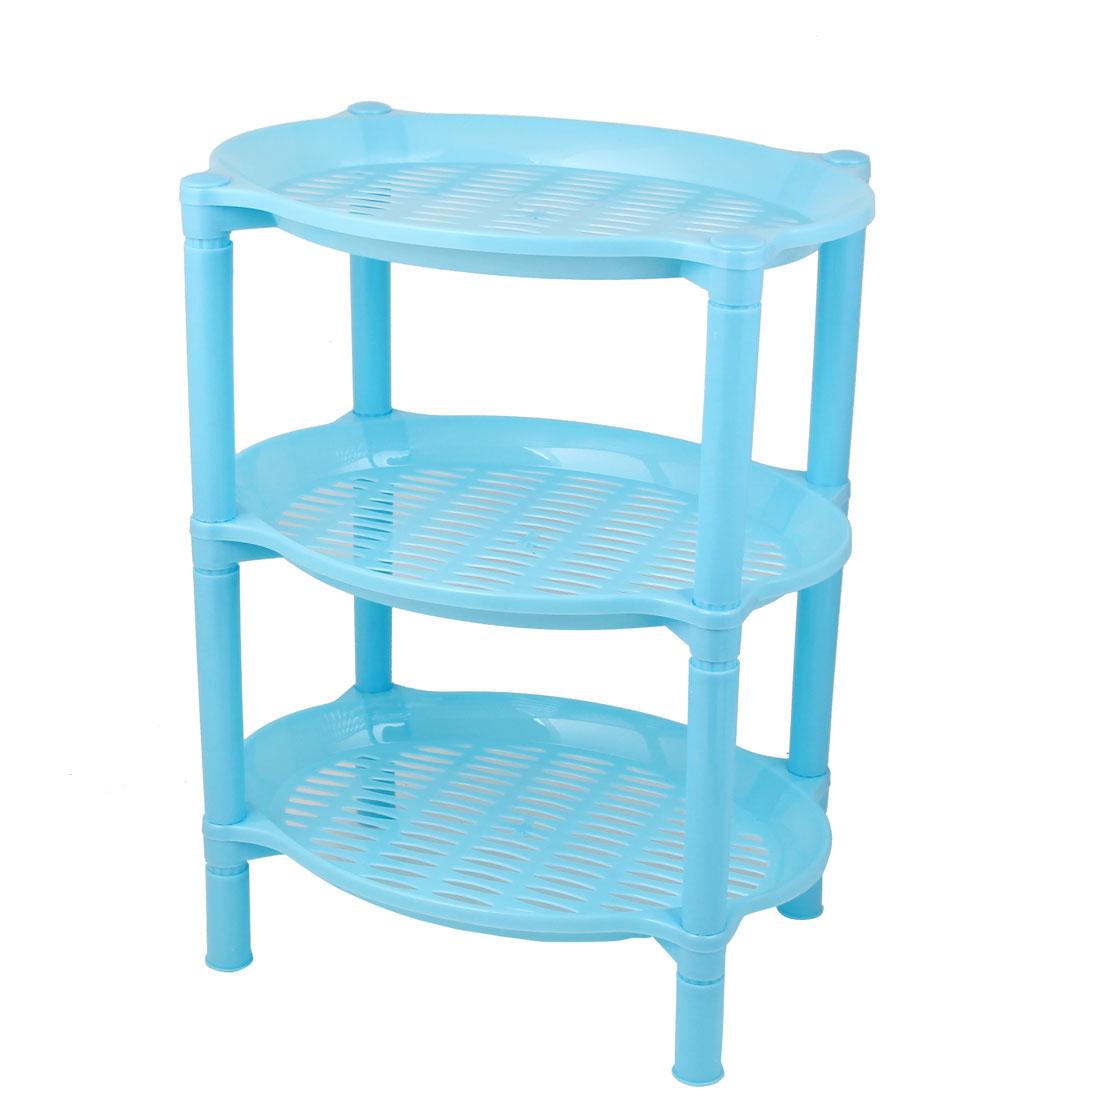 Detachable Three Layer Blue Plastic Mini Shelves Rack Storage